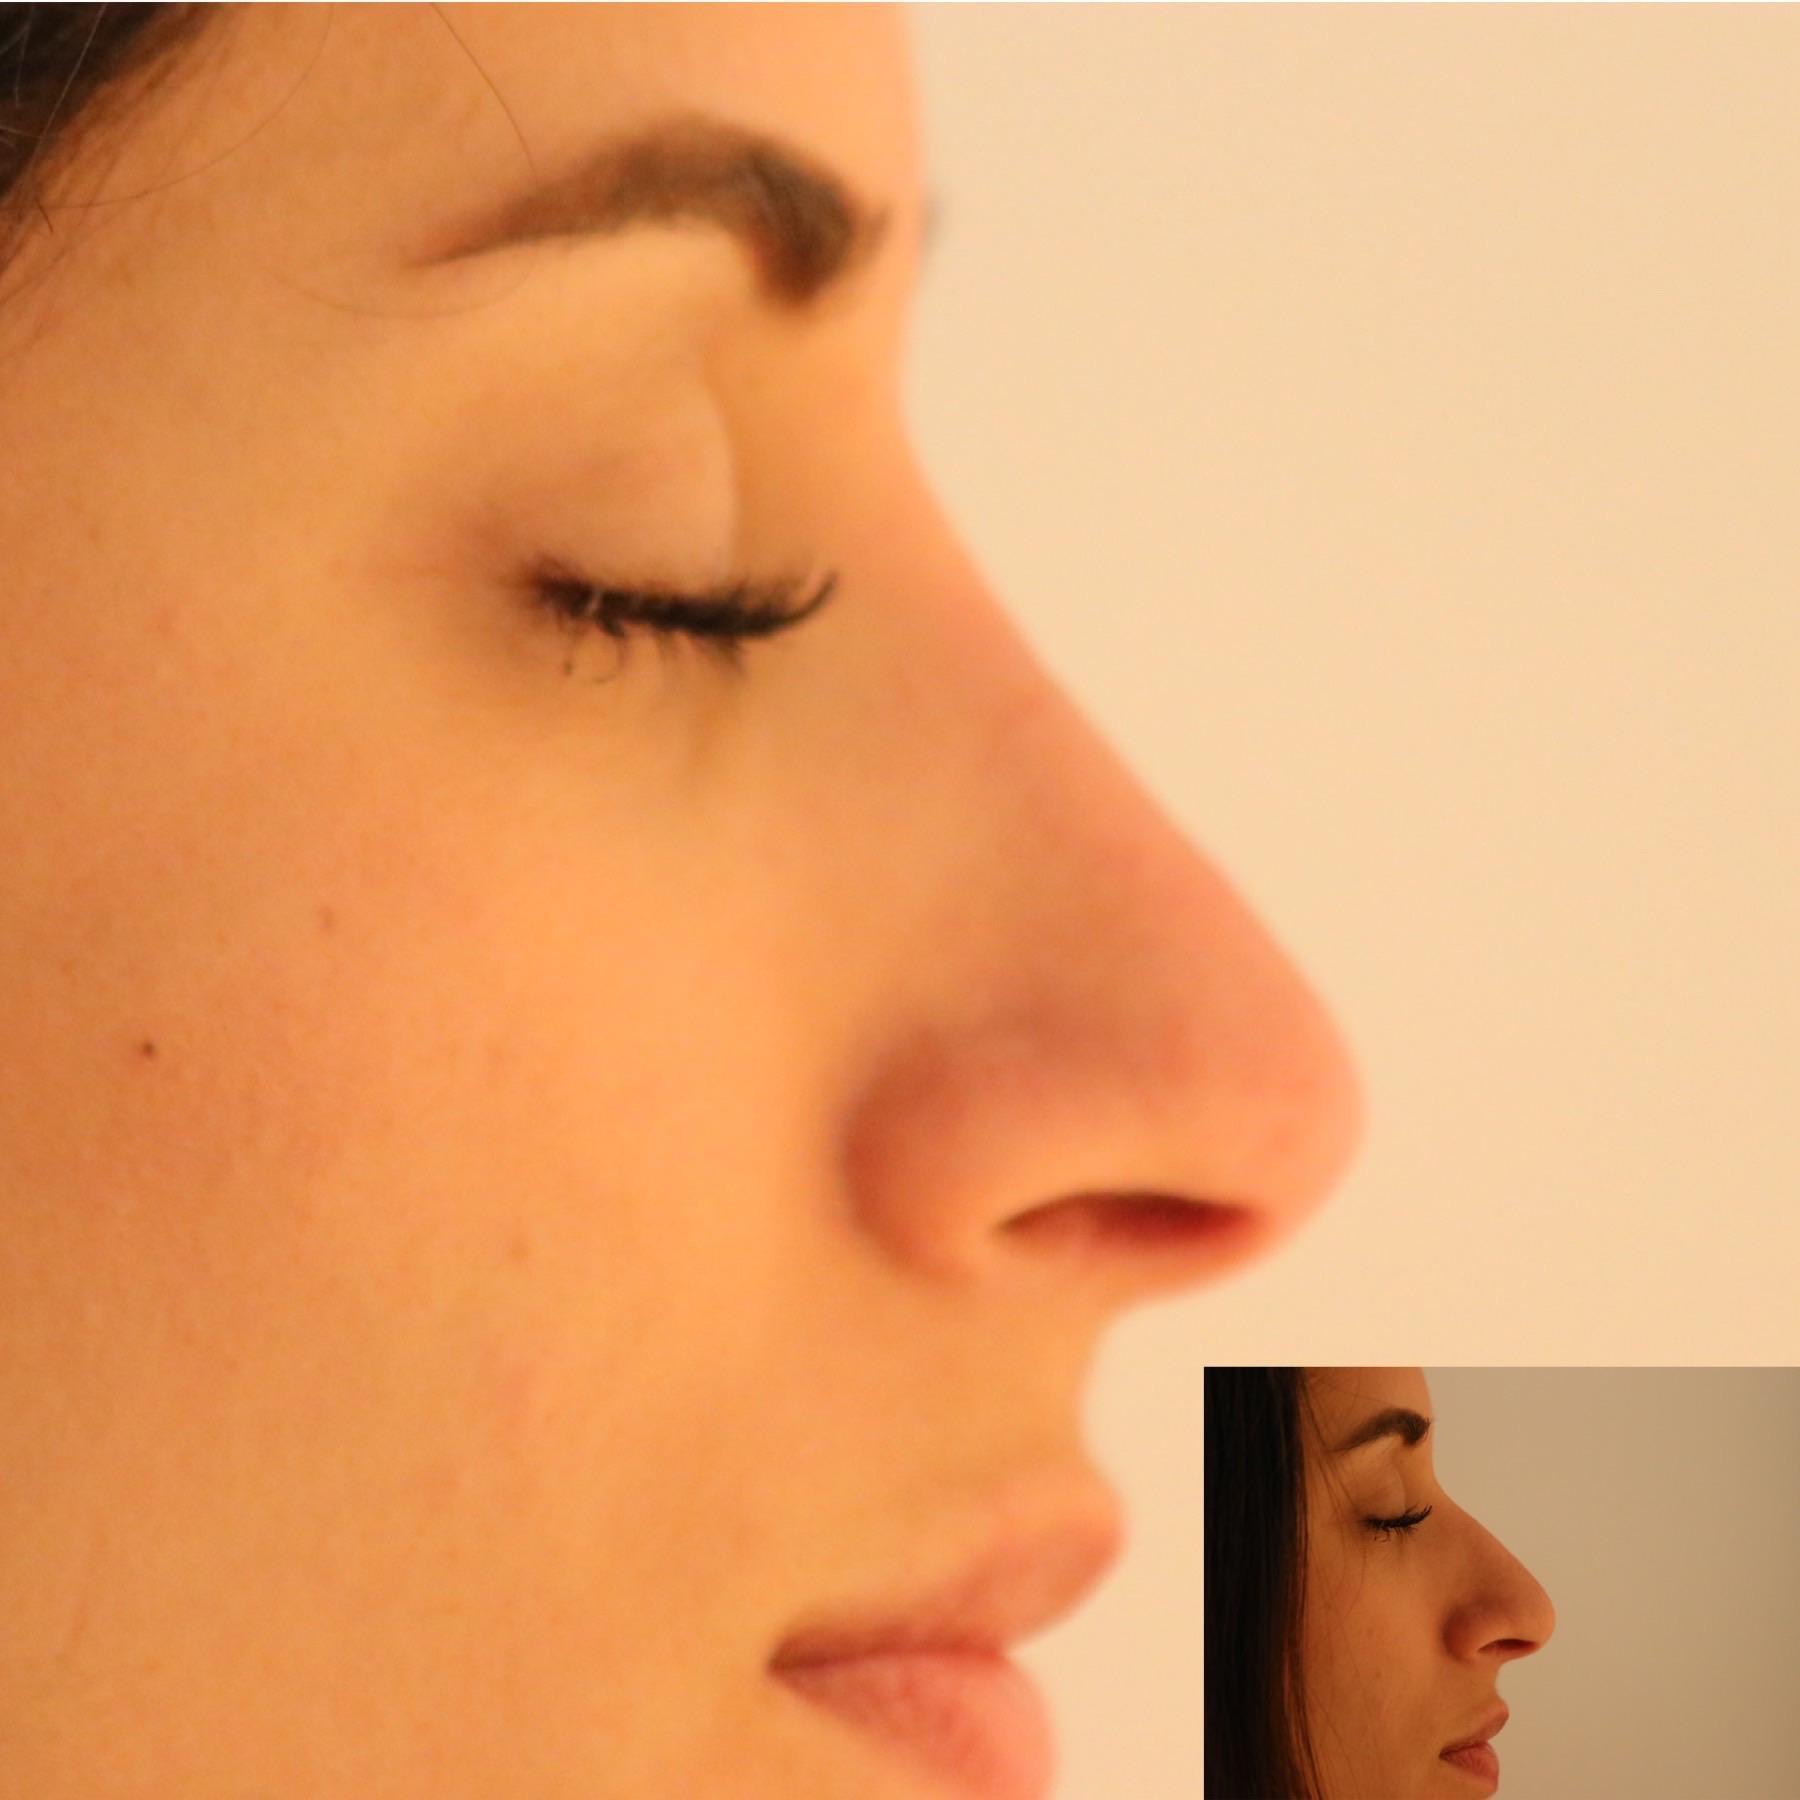 Nase ohne OP Paderborn - Mc Aesthetics   Erfahrungen